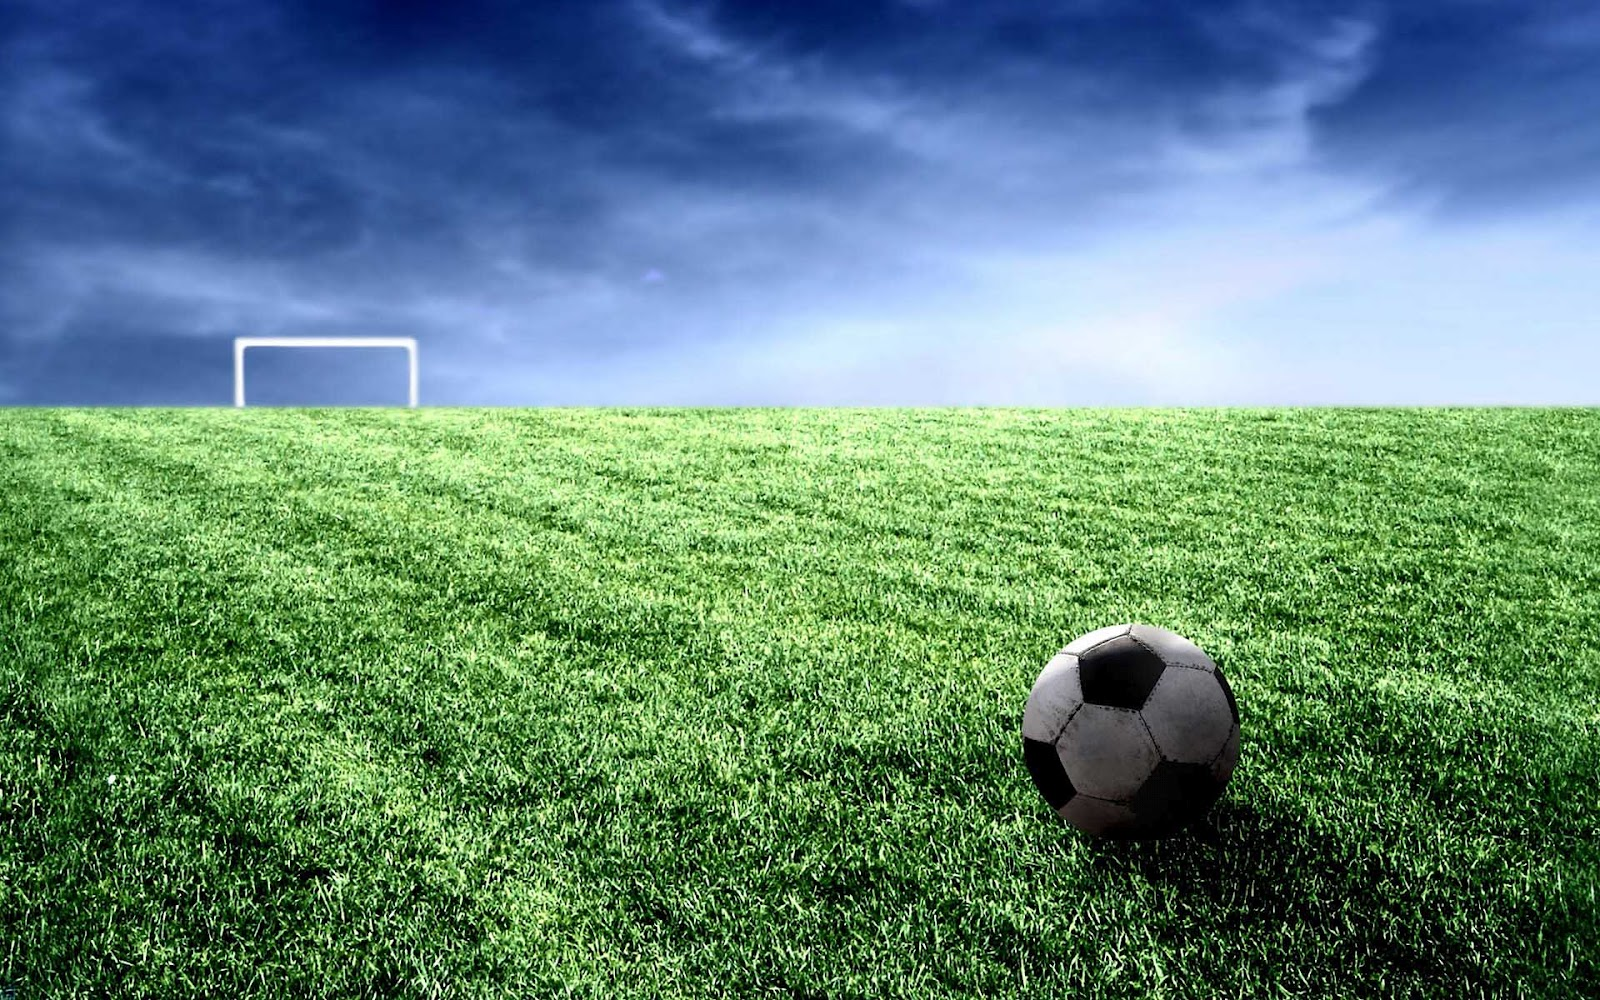 Junho 2014 gui do esporte - Football field wallpaper hd ...